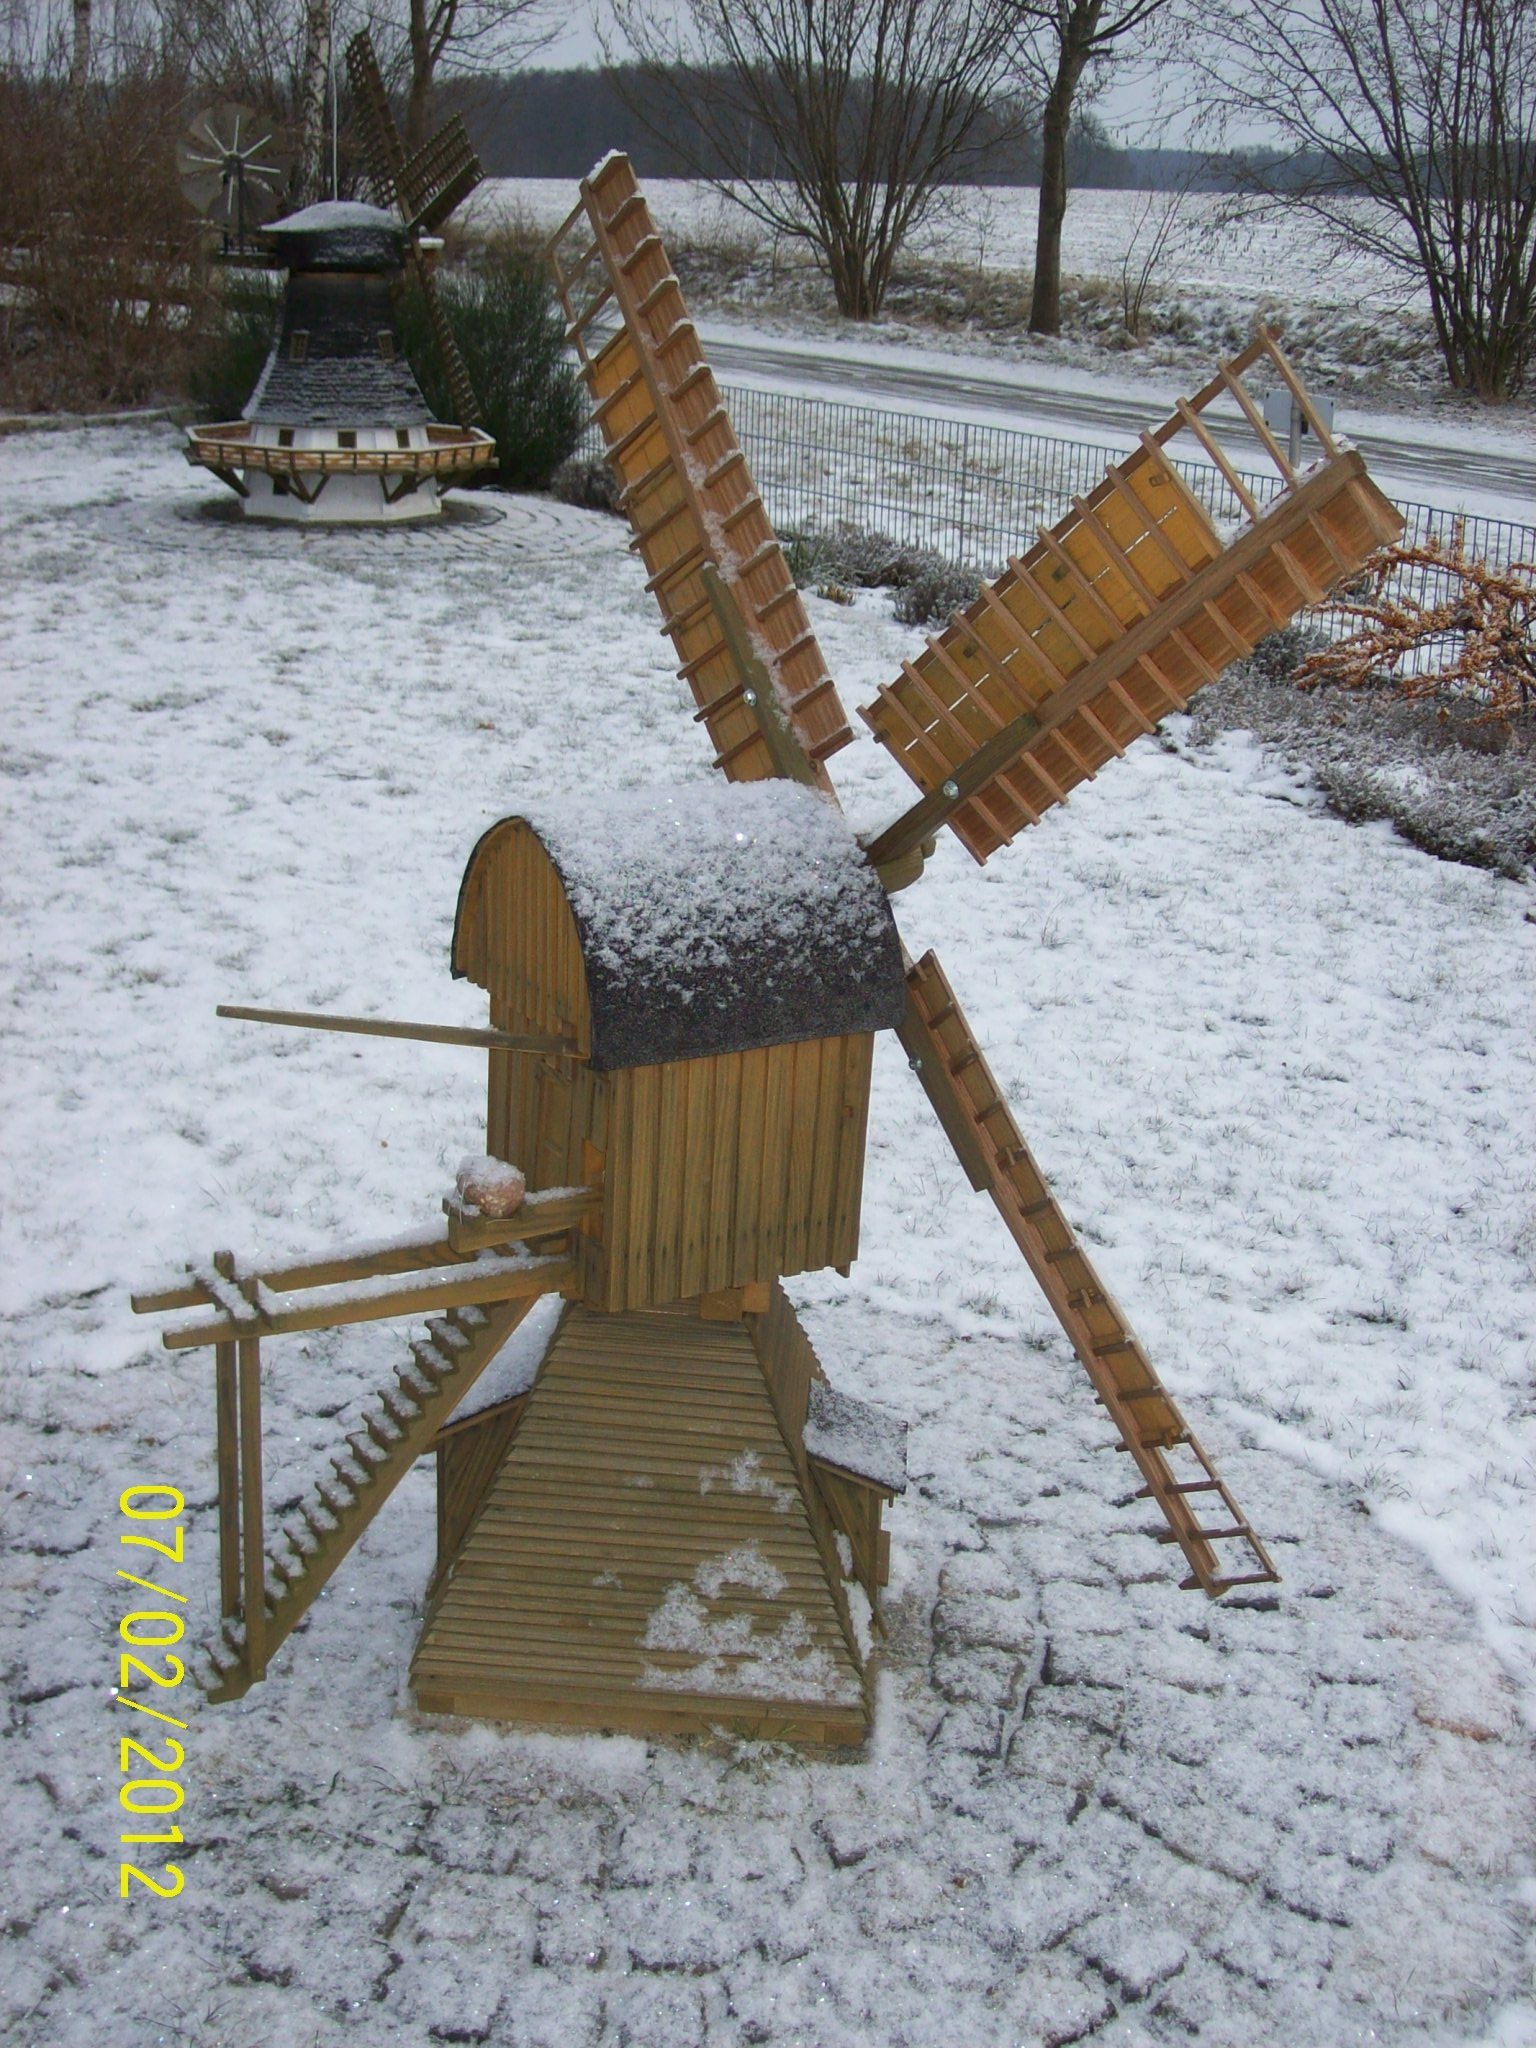 Gartenwindmuhle 3 Bauanleitung Zum Selber Bauen Gartenwindmuhle Windmuhle Muhle